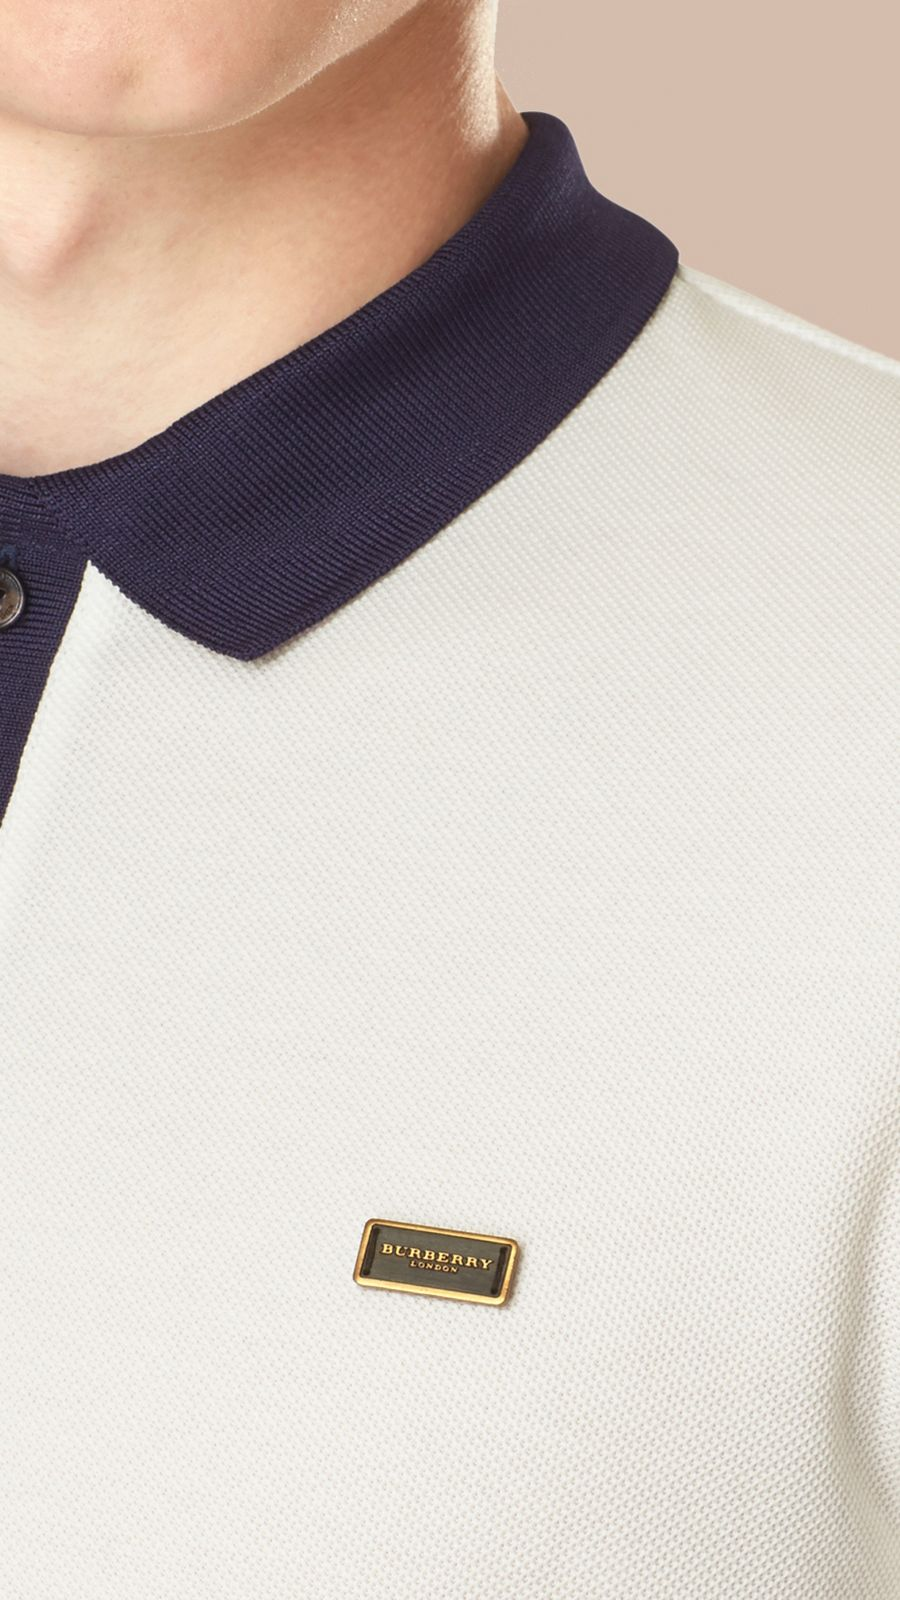 White/navy Mercerised Cotton Polo Shirt White/navy - Image 2